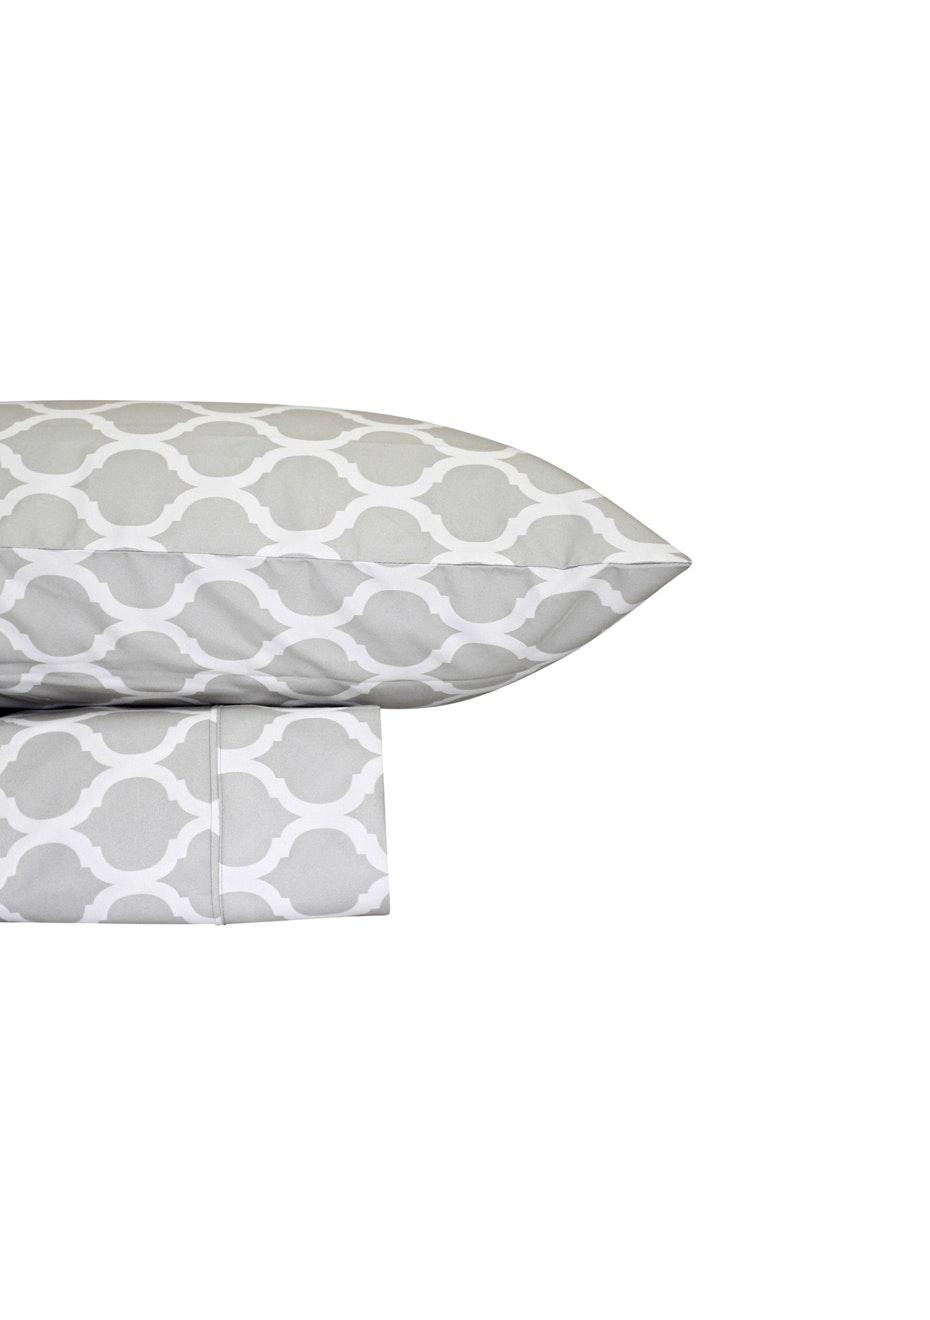 Thermal Flannel Sheet Sets - Morocco Design - Glacier - Double Bed